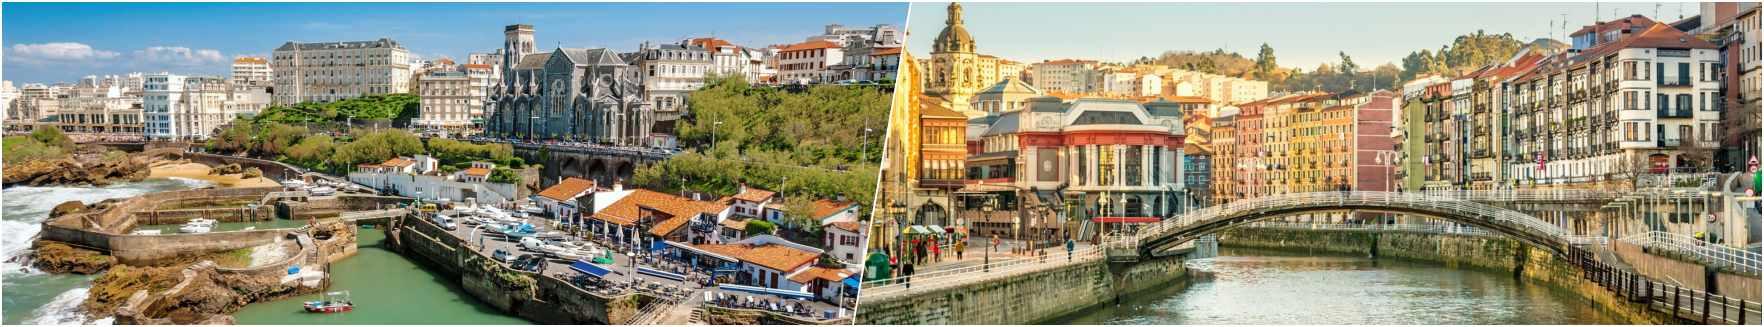 Biarritz - Bilbao